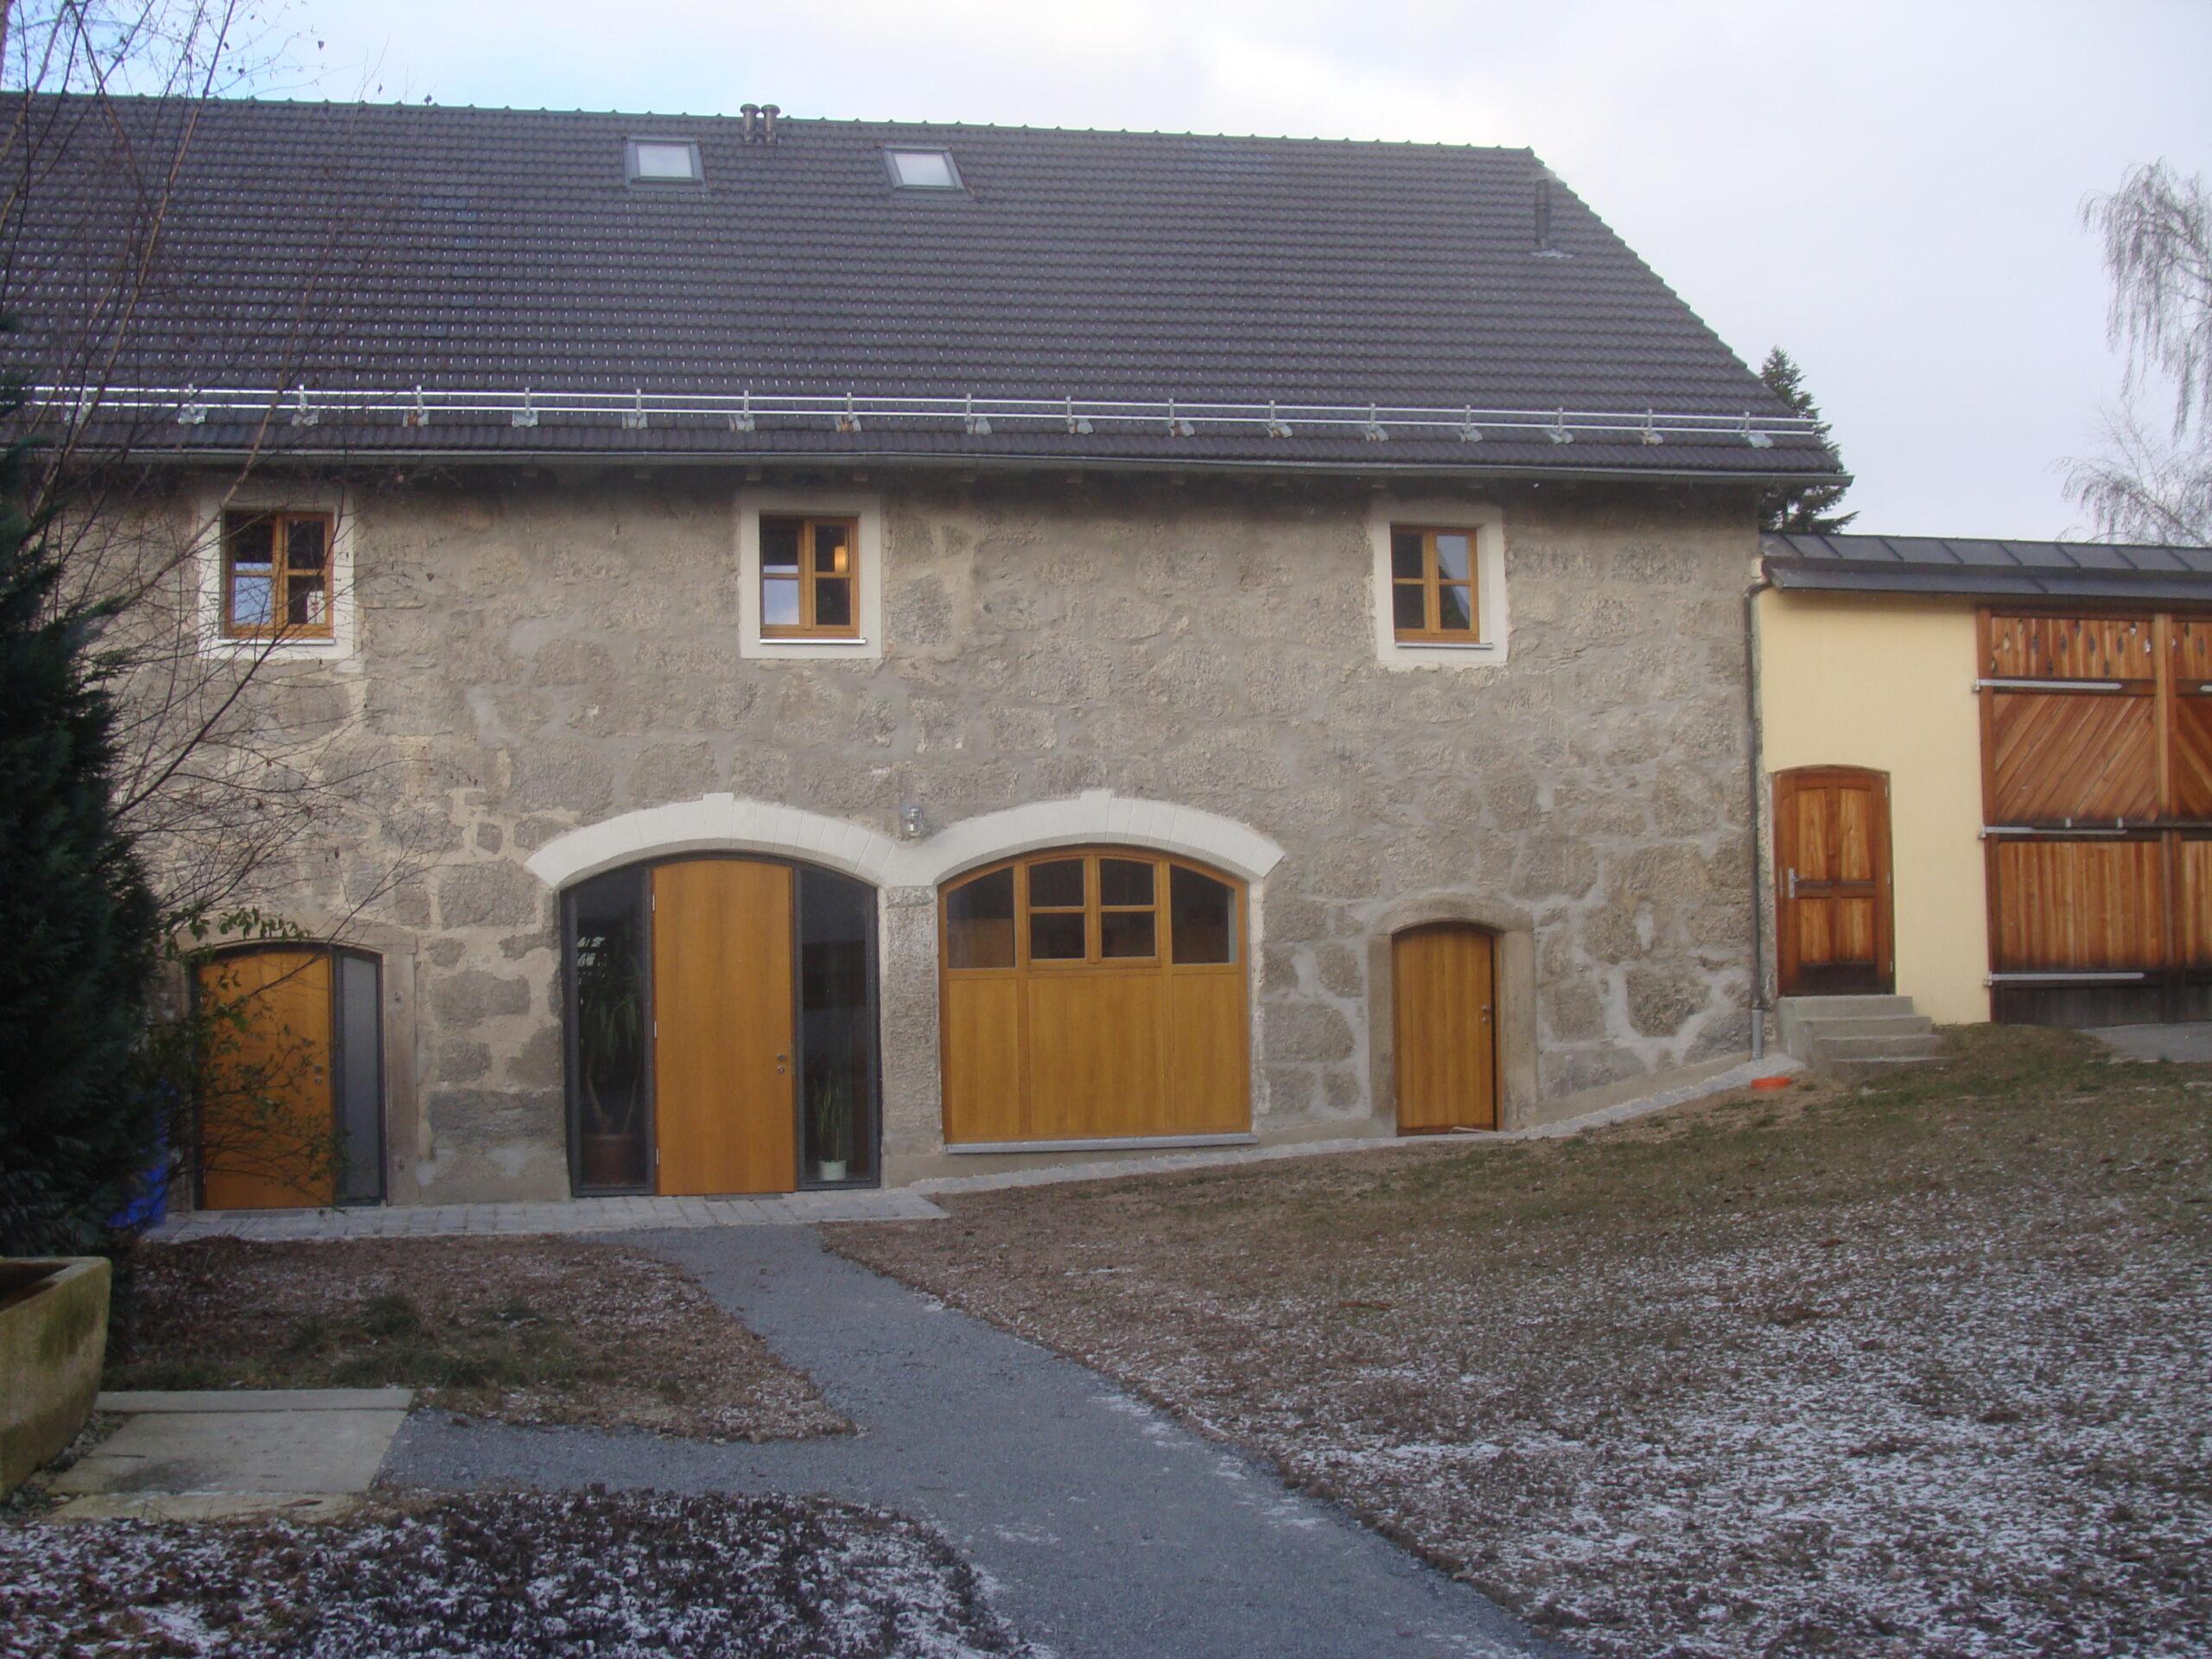 2009-12-15-Hias-Häusl-12